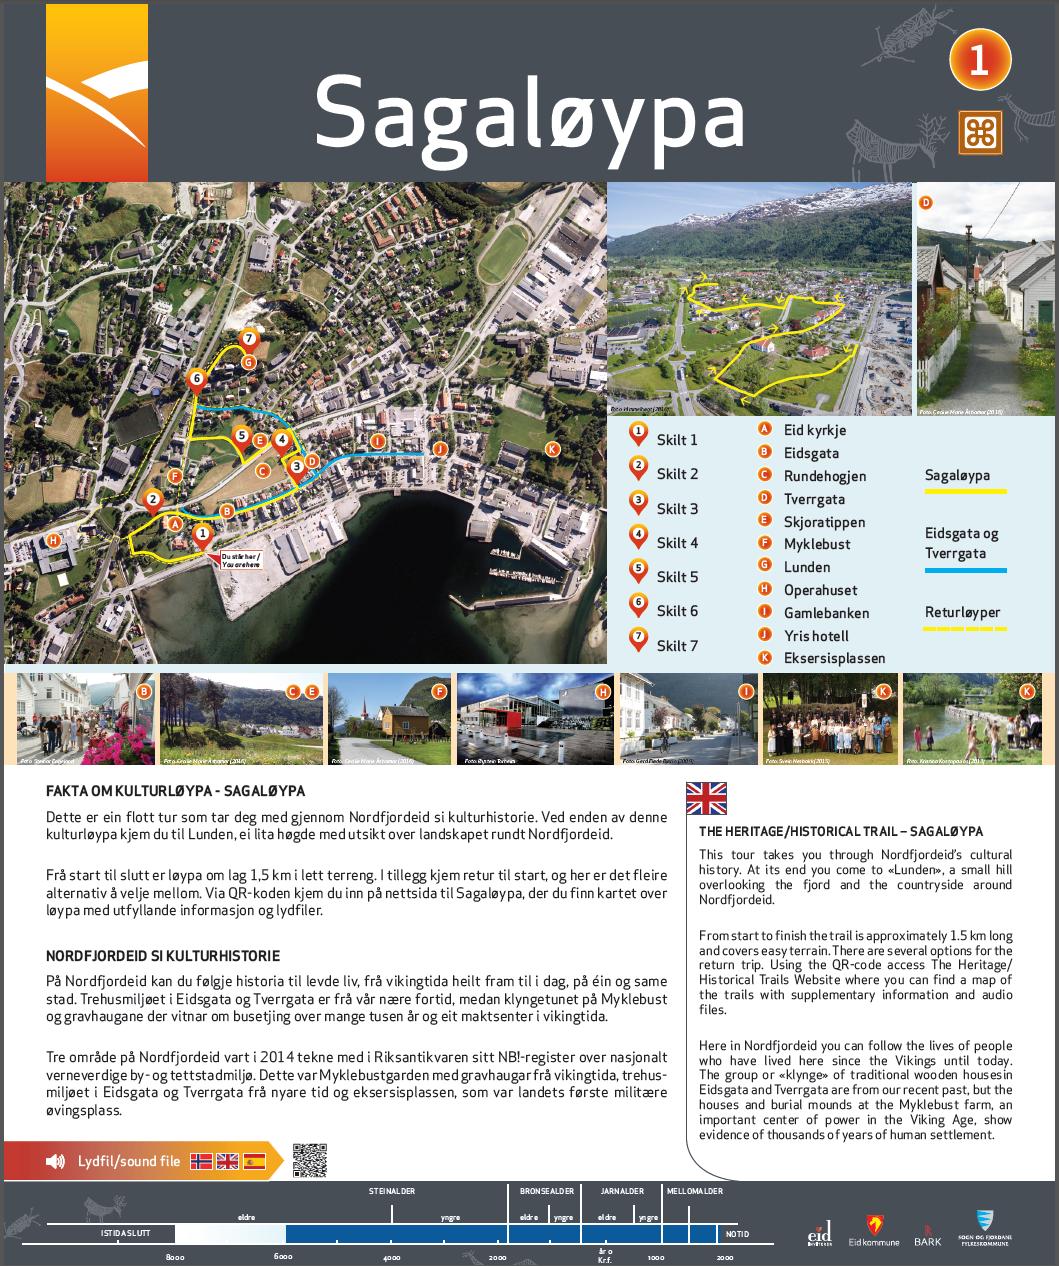 Biletfil av skilt frå Sagaløypa